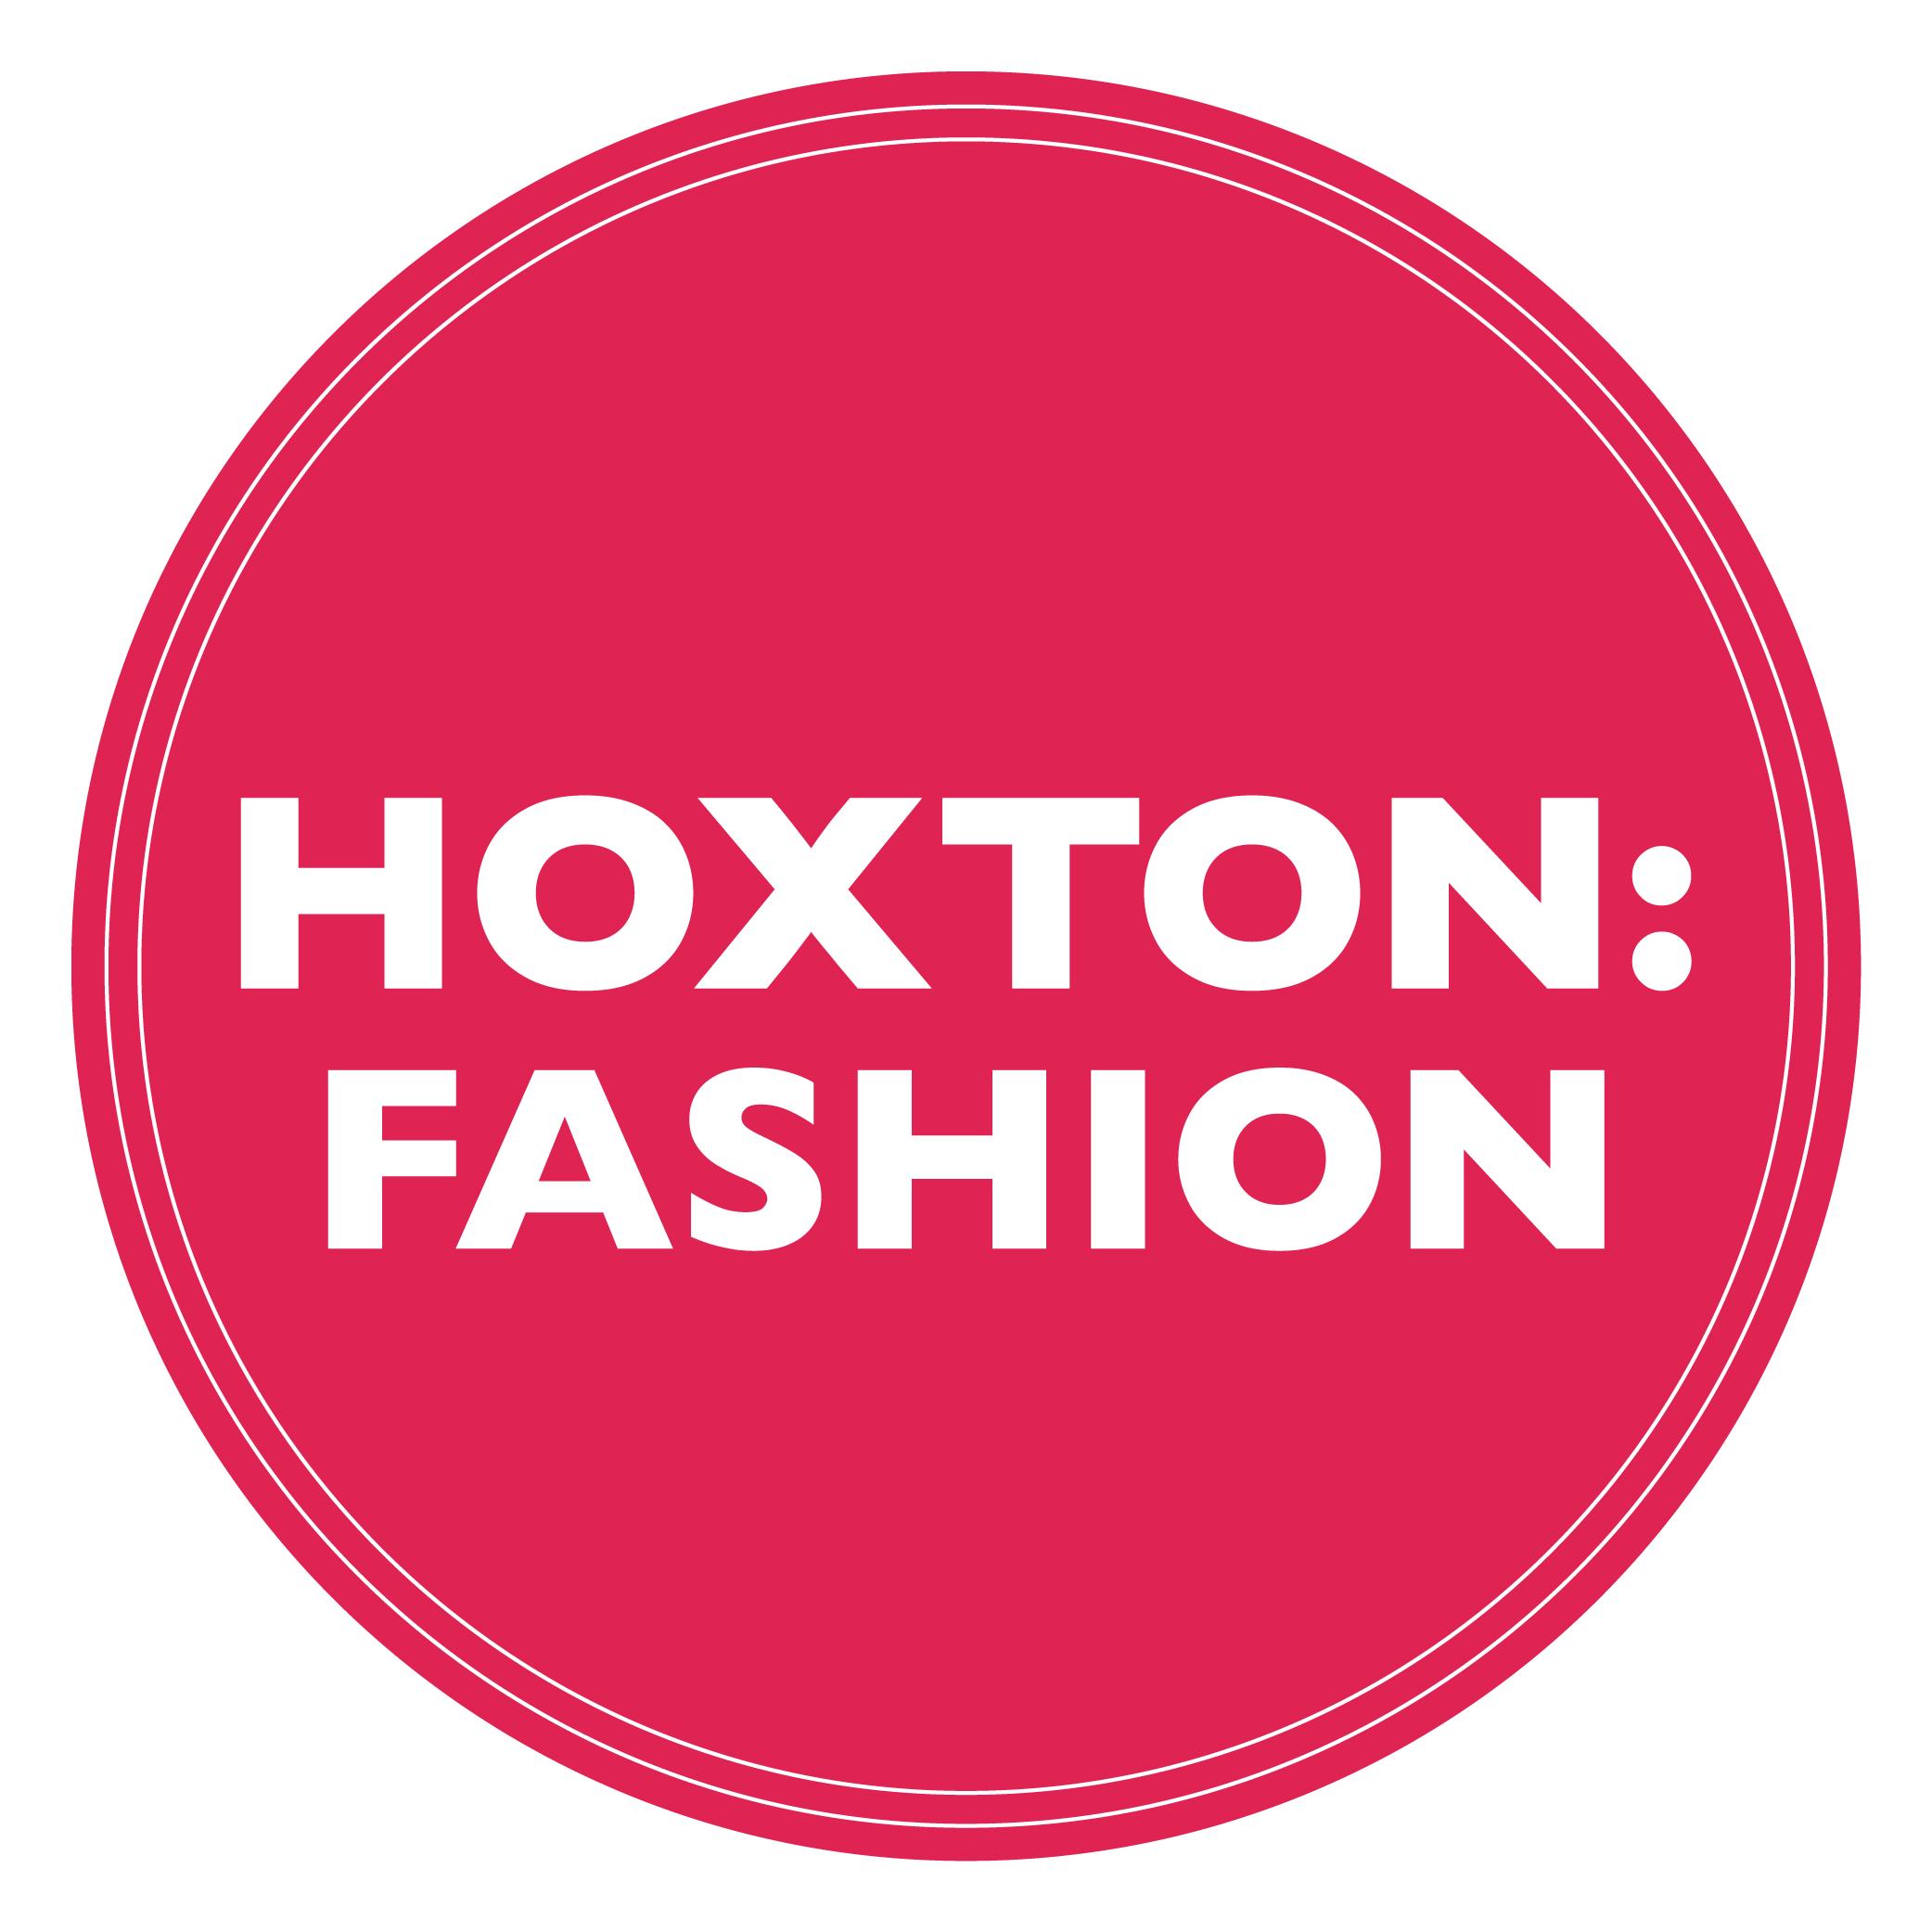 Hoxton-Fashion_Artboard 4 (1)